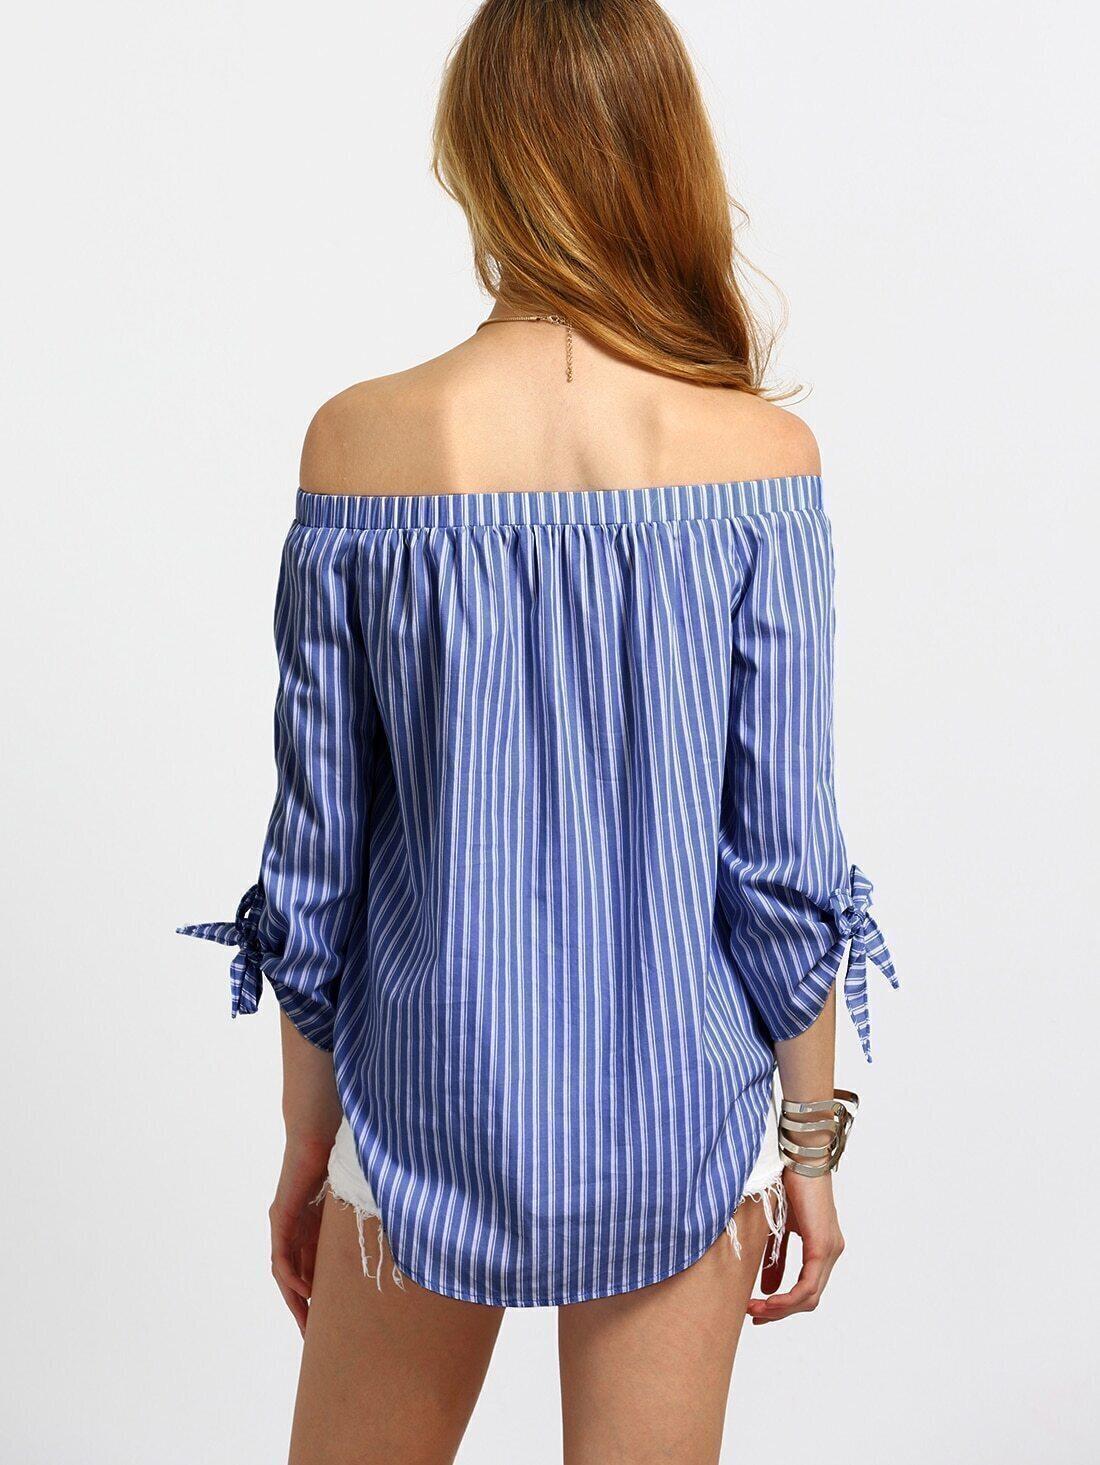 blouse160823701_2